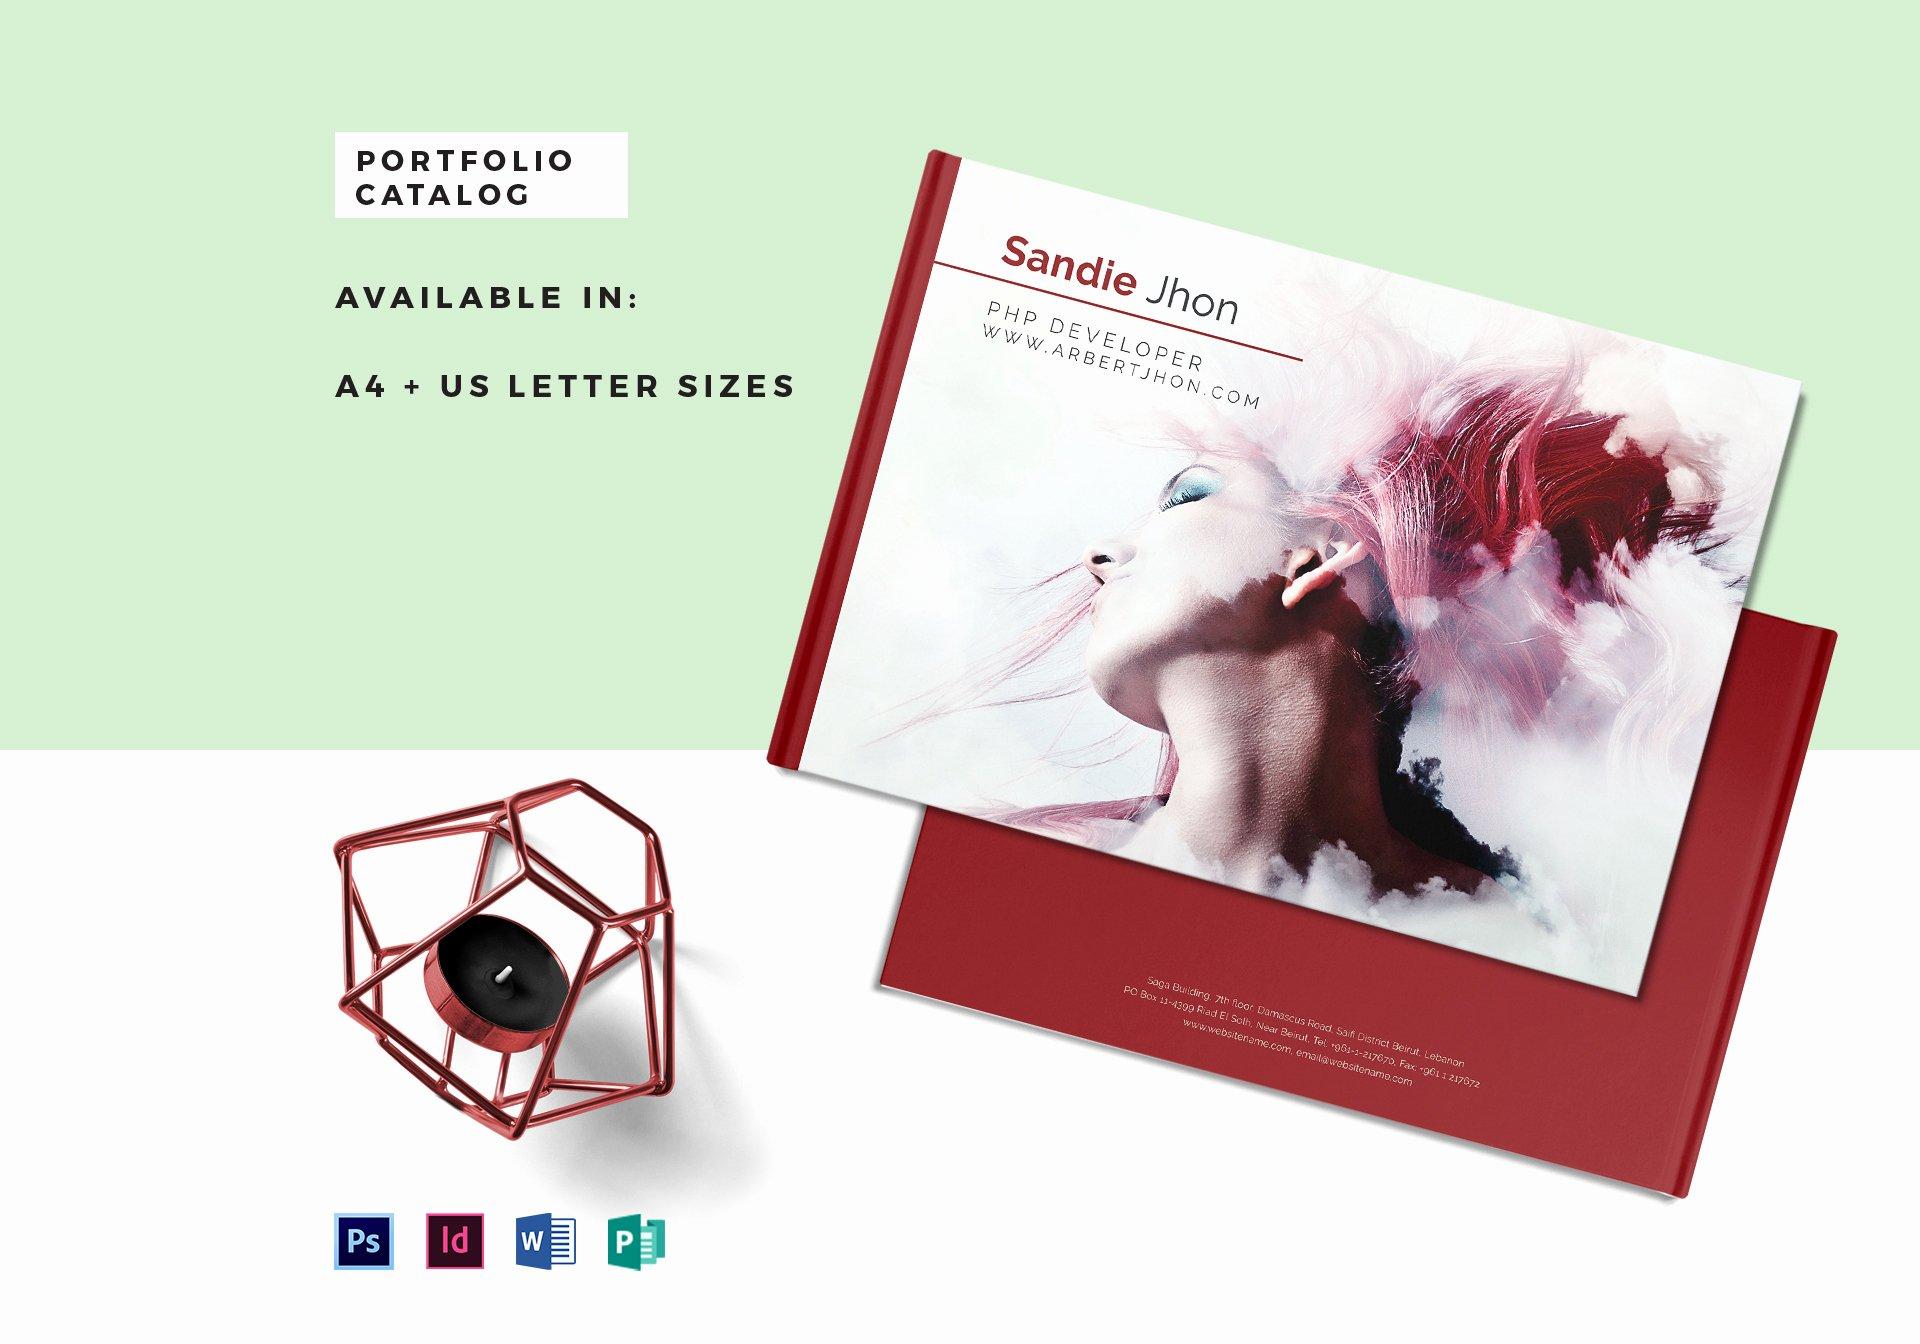 Free Indesign Portfolio Templates Fresh Editable Portfolio Catalog Template In Psd Word